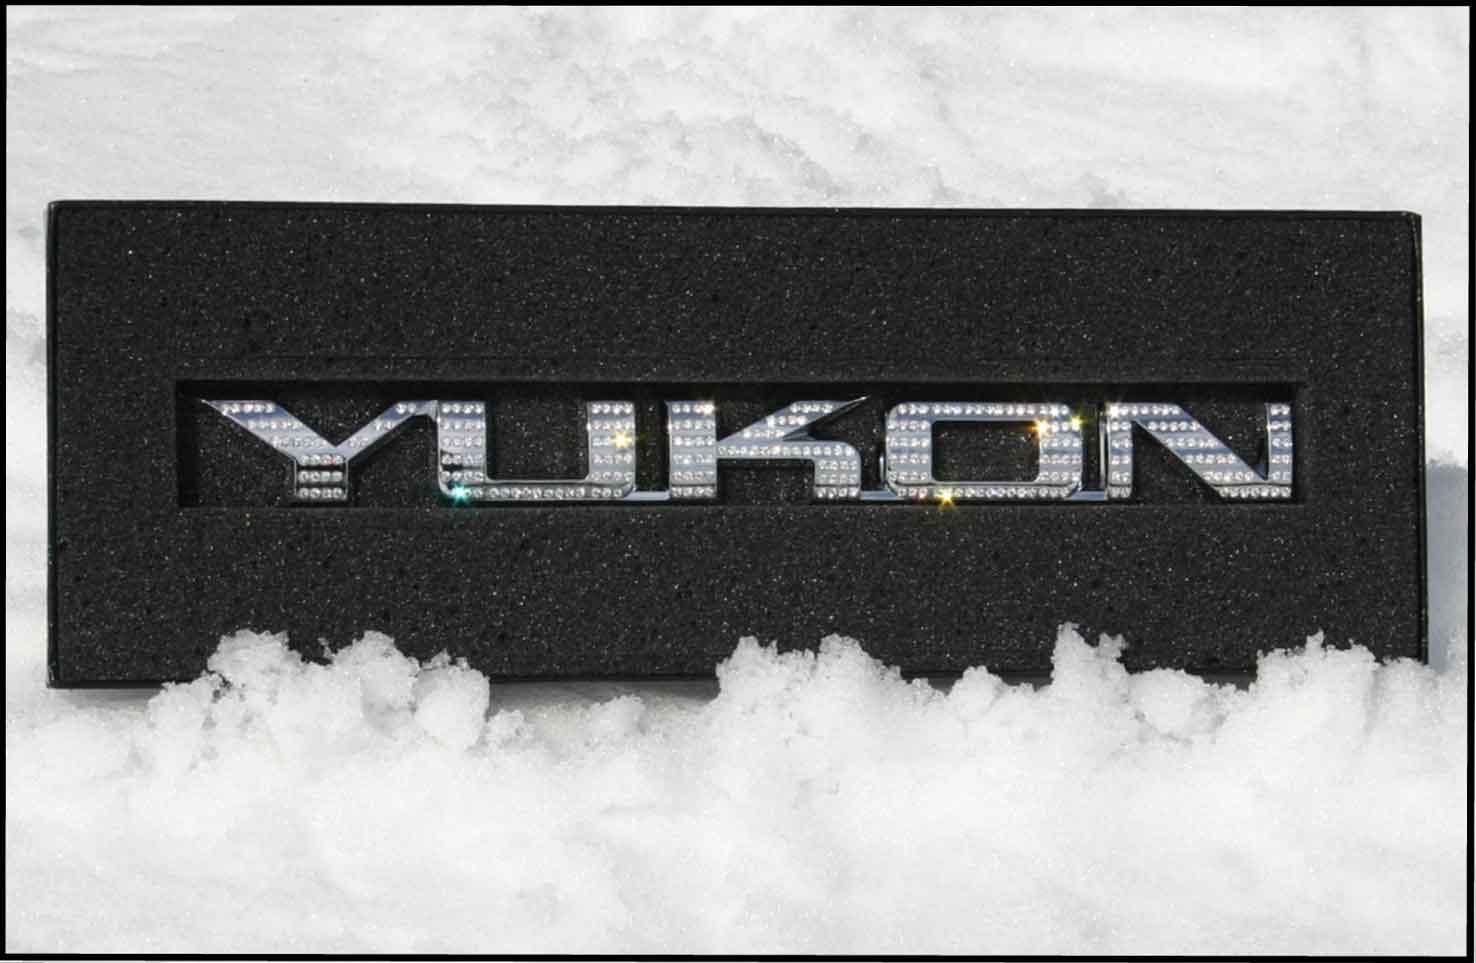 Iced Out Emz Chrome Gmc Yukon Swarovski Emblem Badge